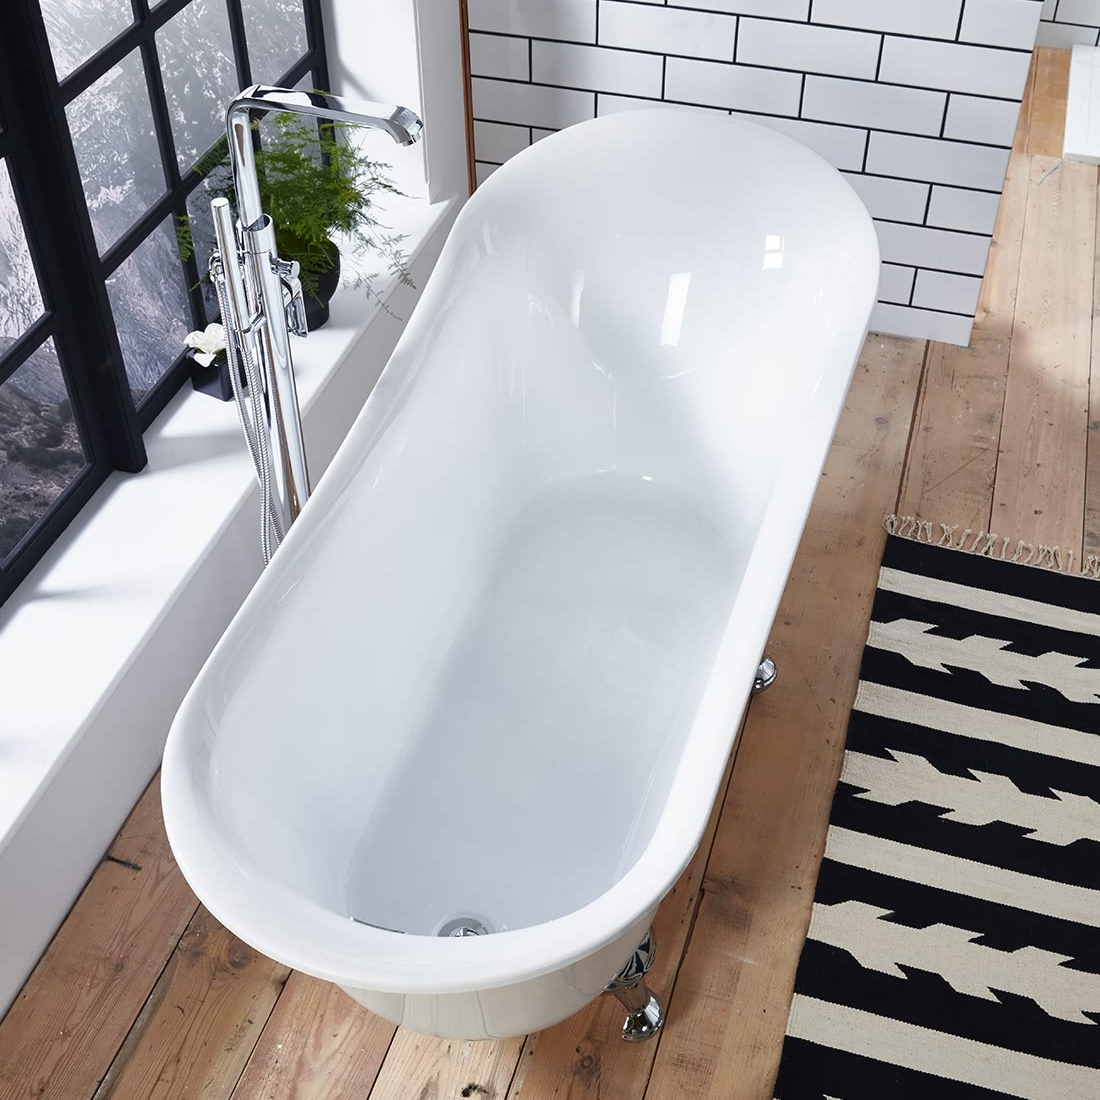 Verona Belmont Freestanding Slipper Bath with Chrome Ball Feet 1520mm x 710mm - White-1